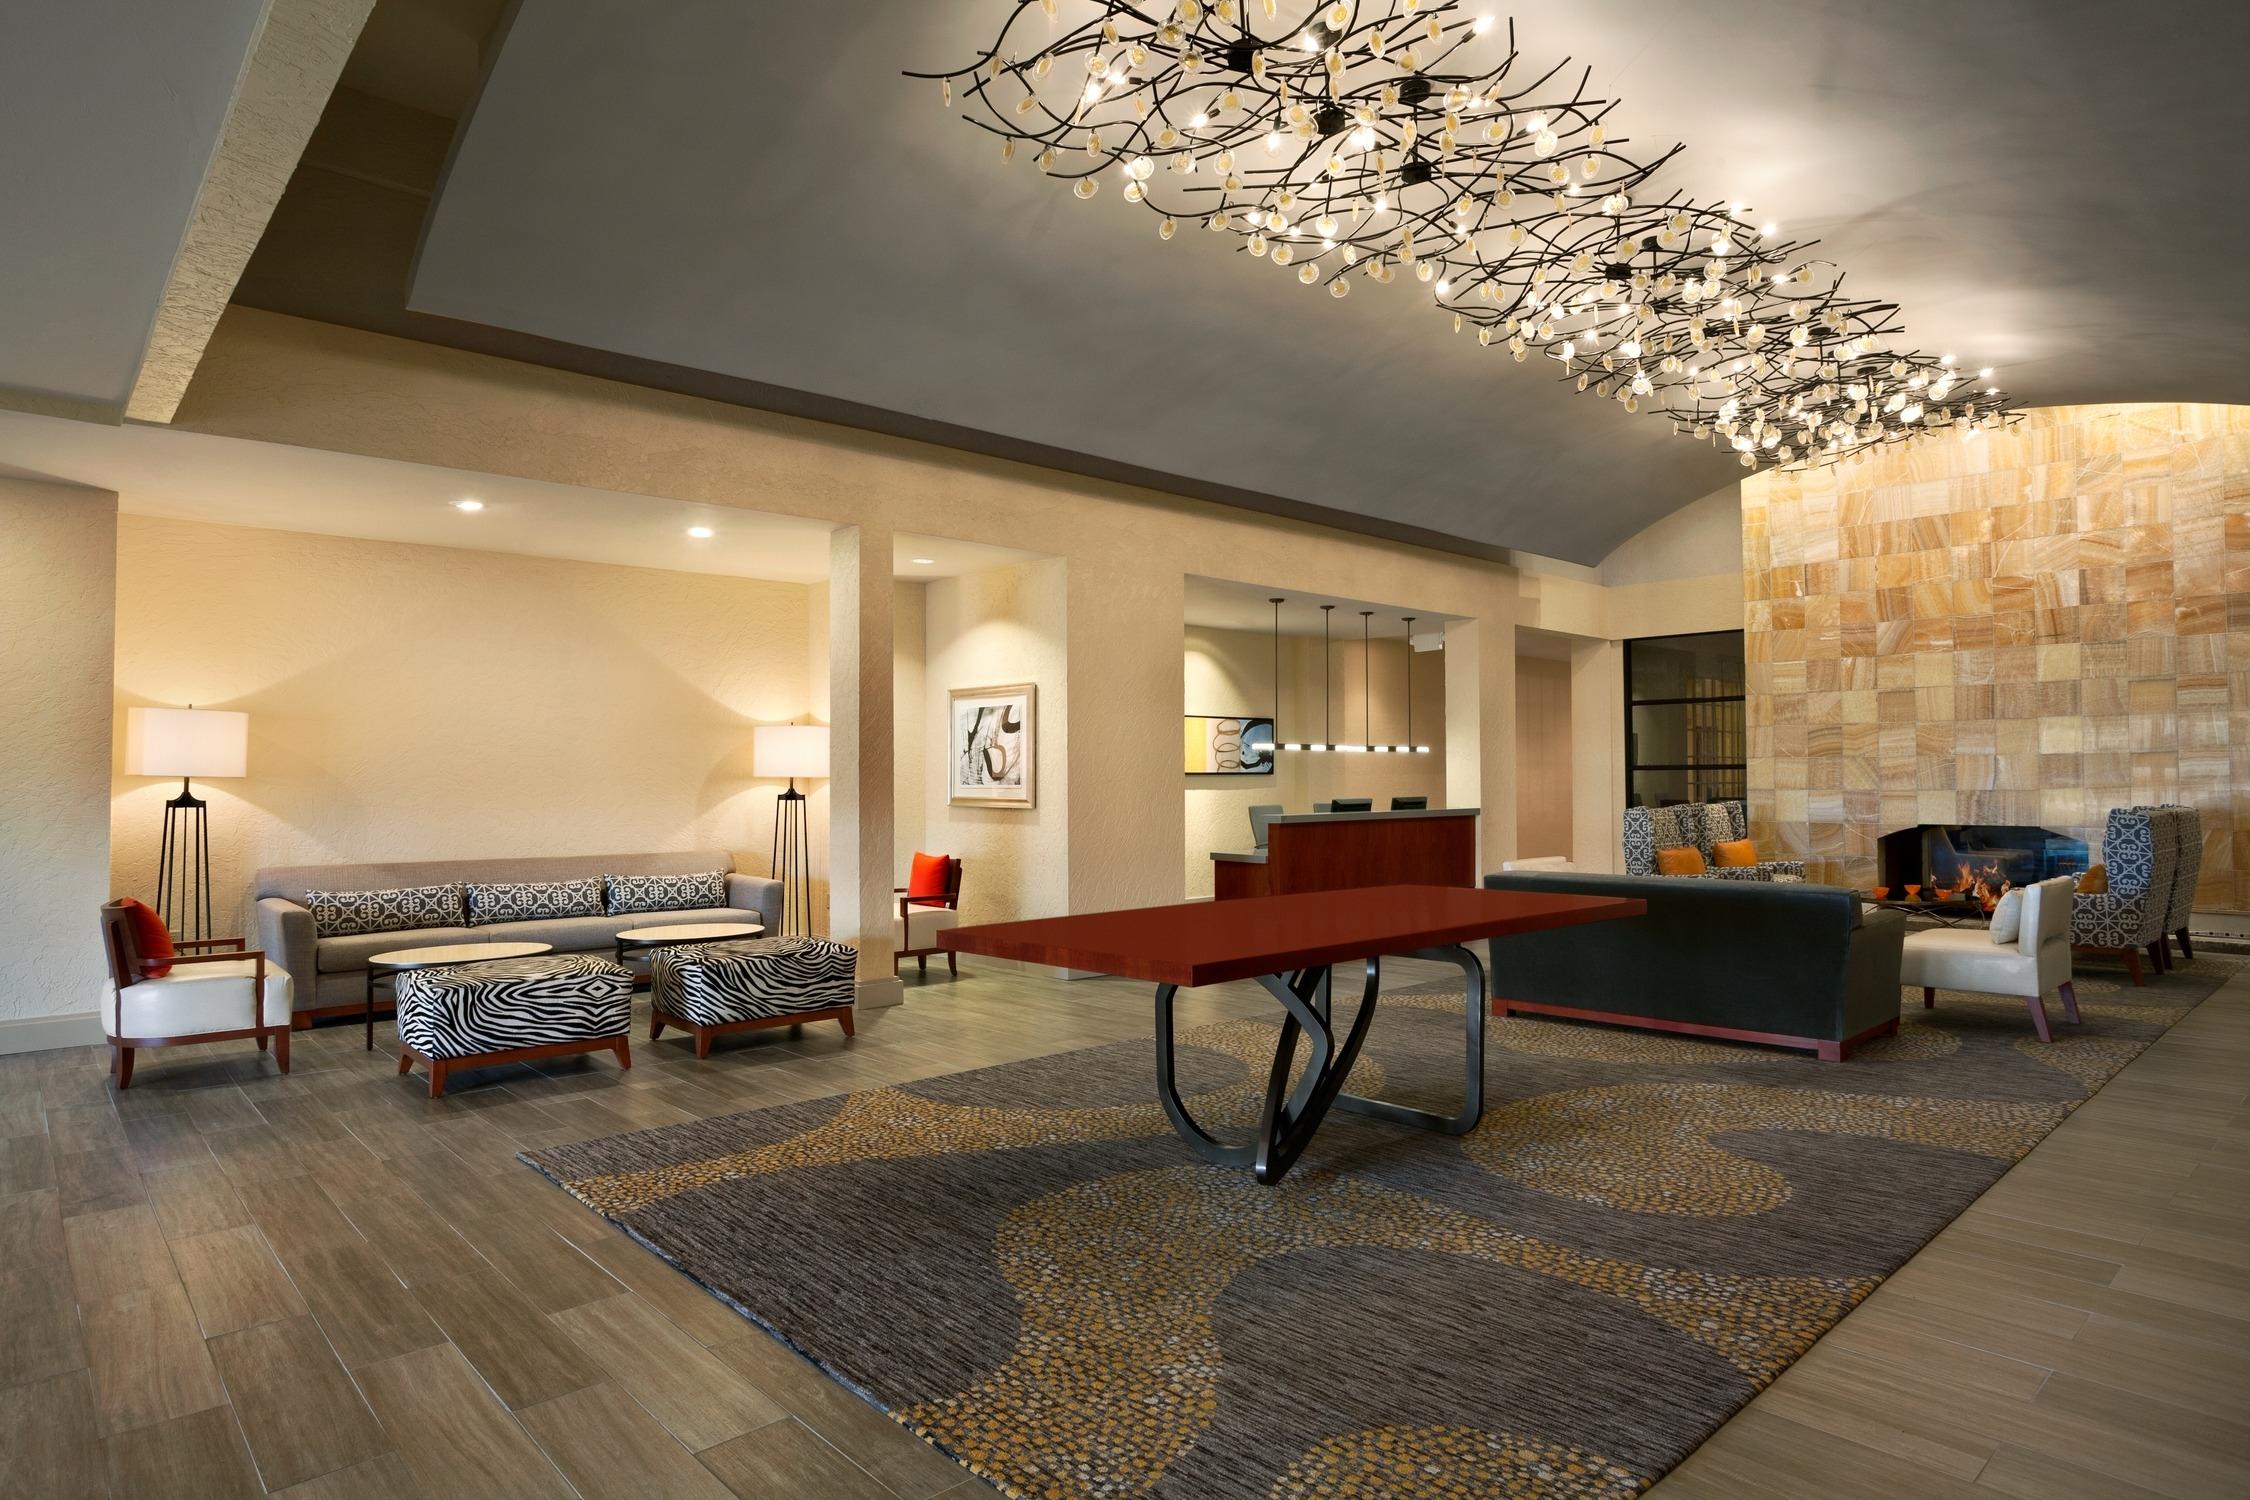 doubletree by hilton hotel salt lake city airport salt. Black Bedroom Furniture Sets. Home Design Ideas